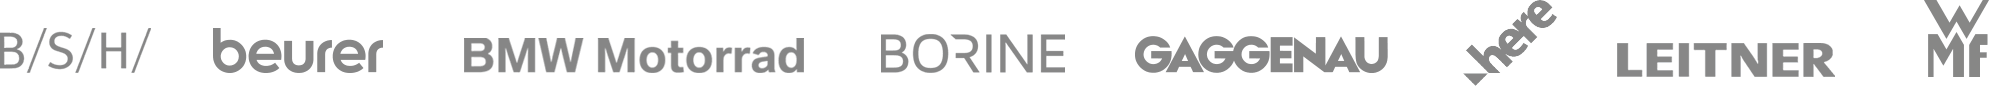 logos ahackenberg design